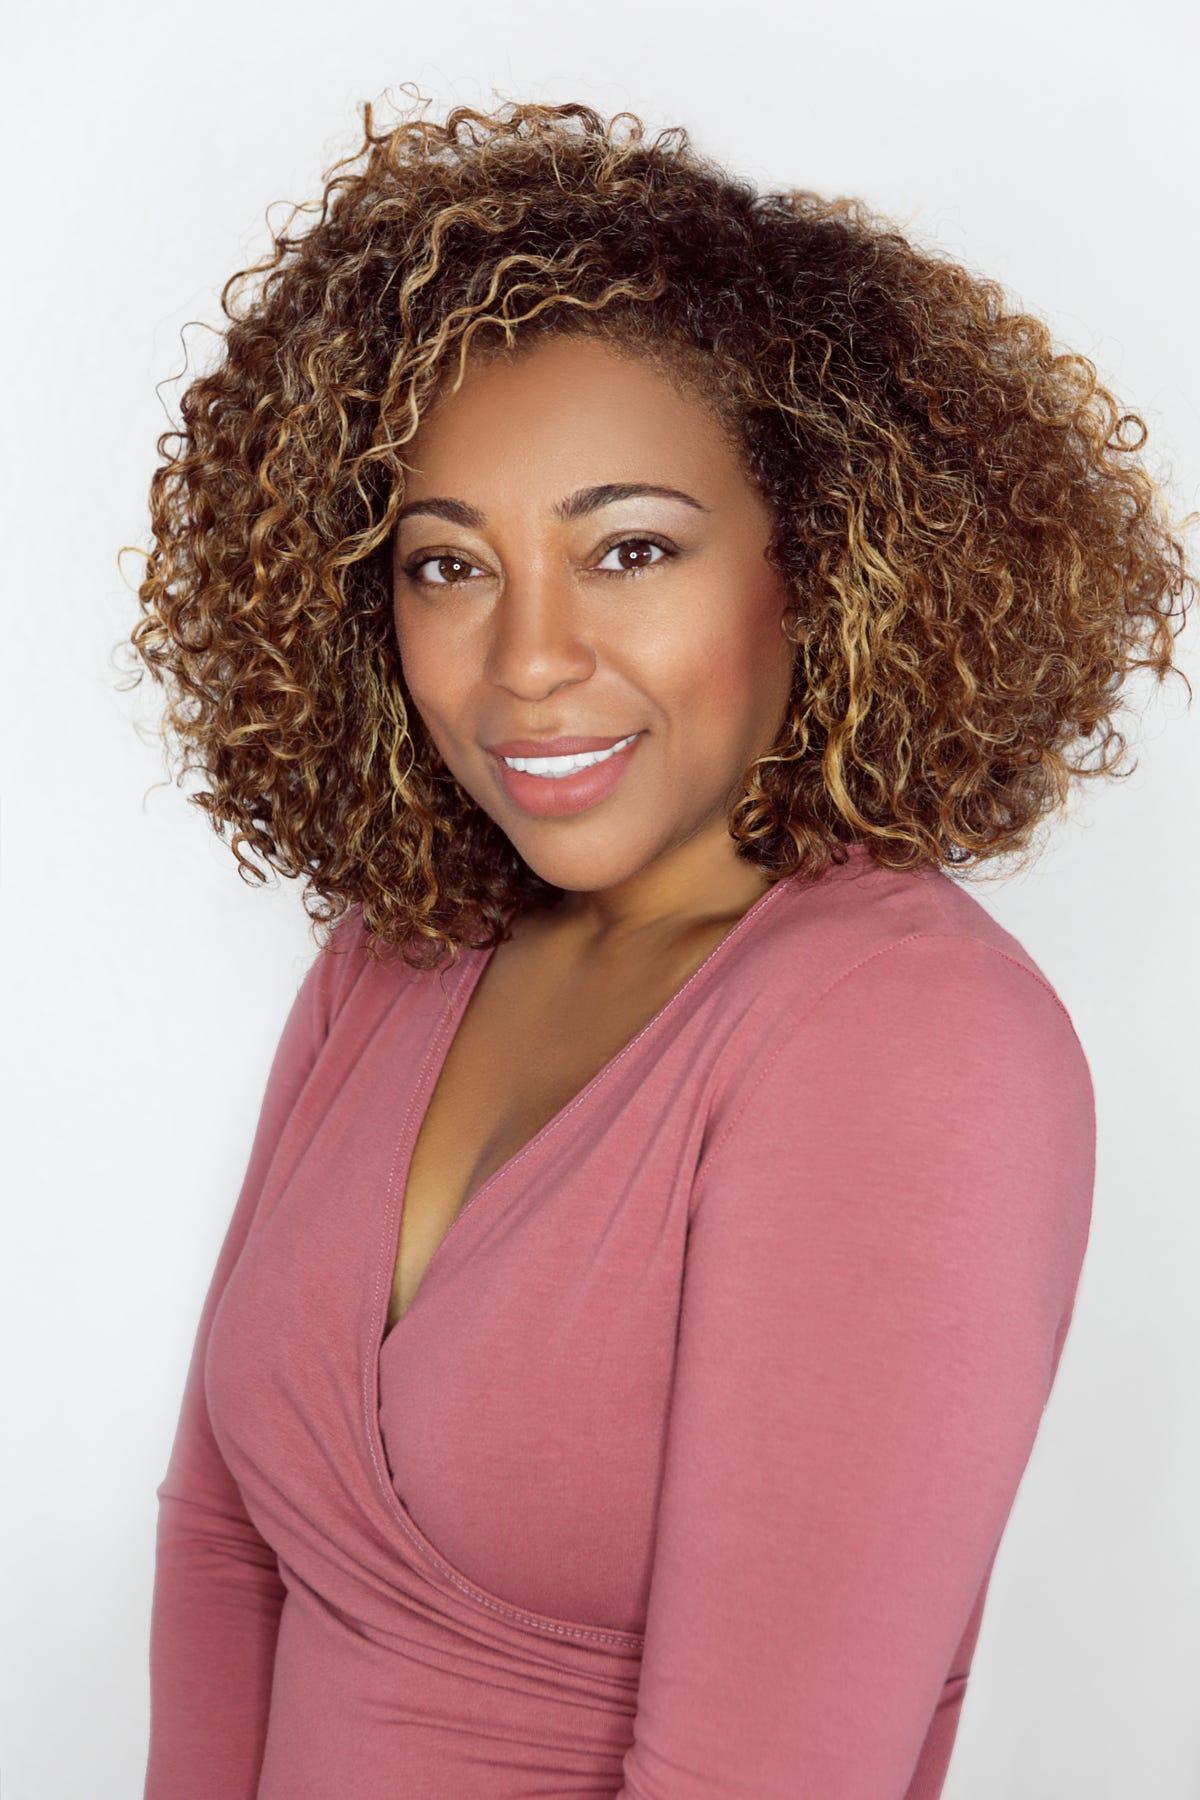 How I became a celebrity hairstylist to stars like Alicia